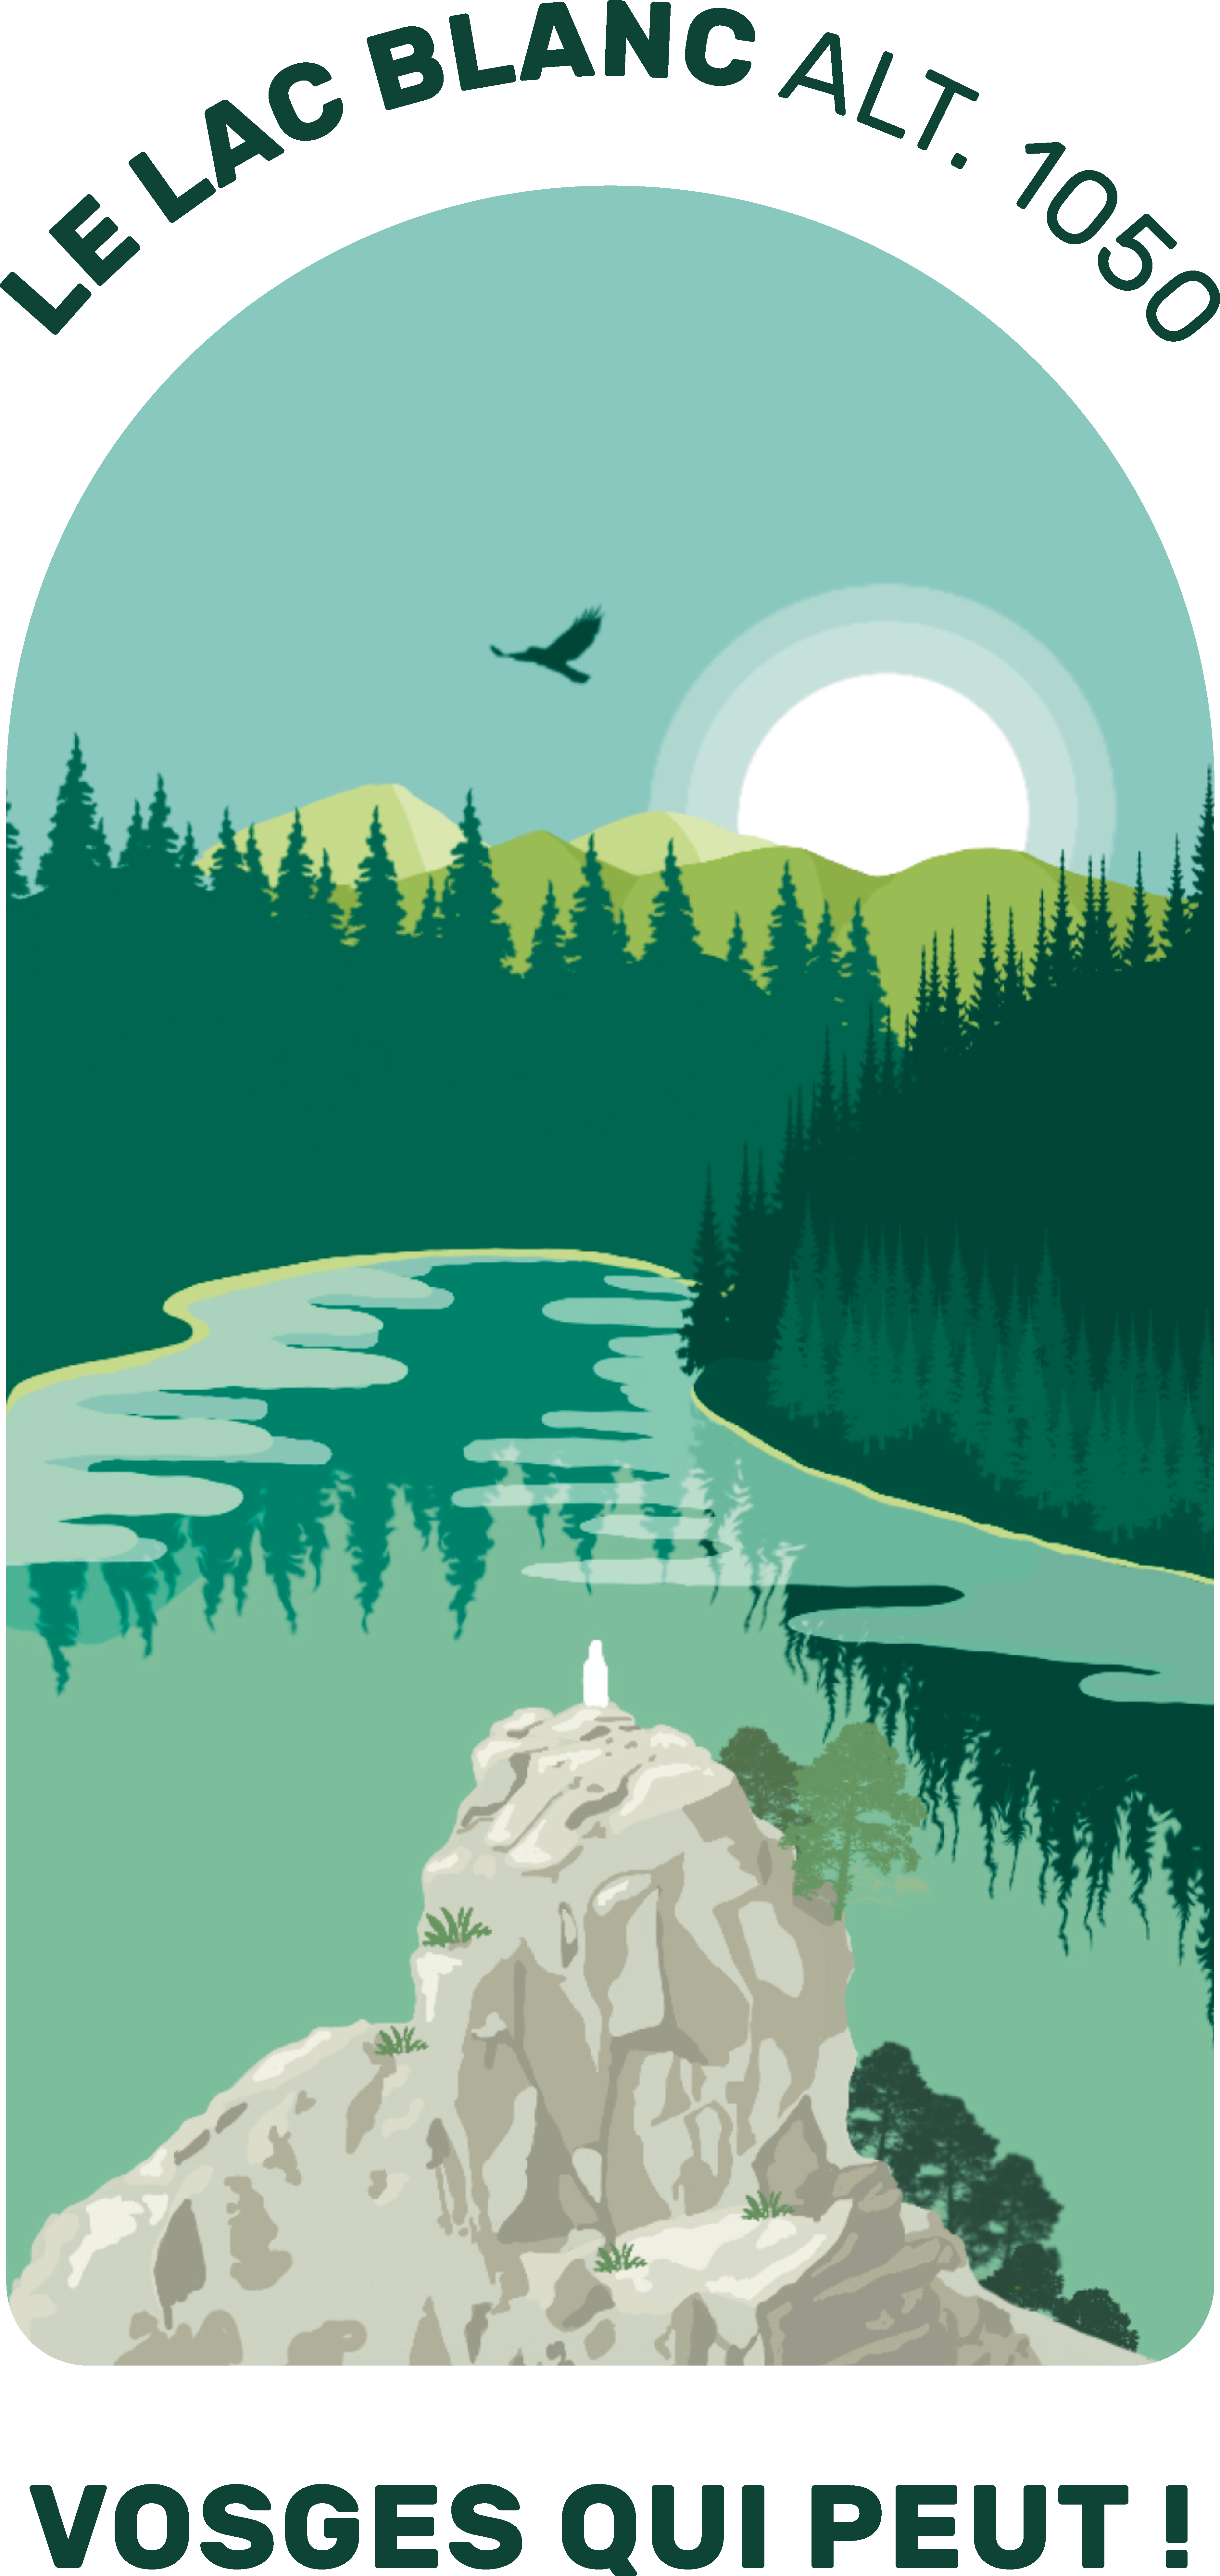 Illustration du lac Blanc